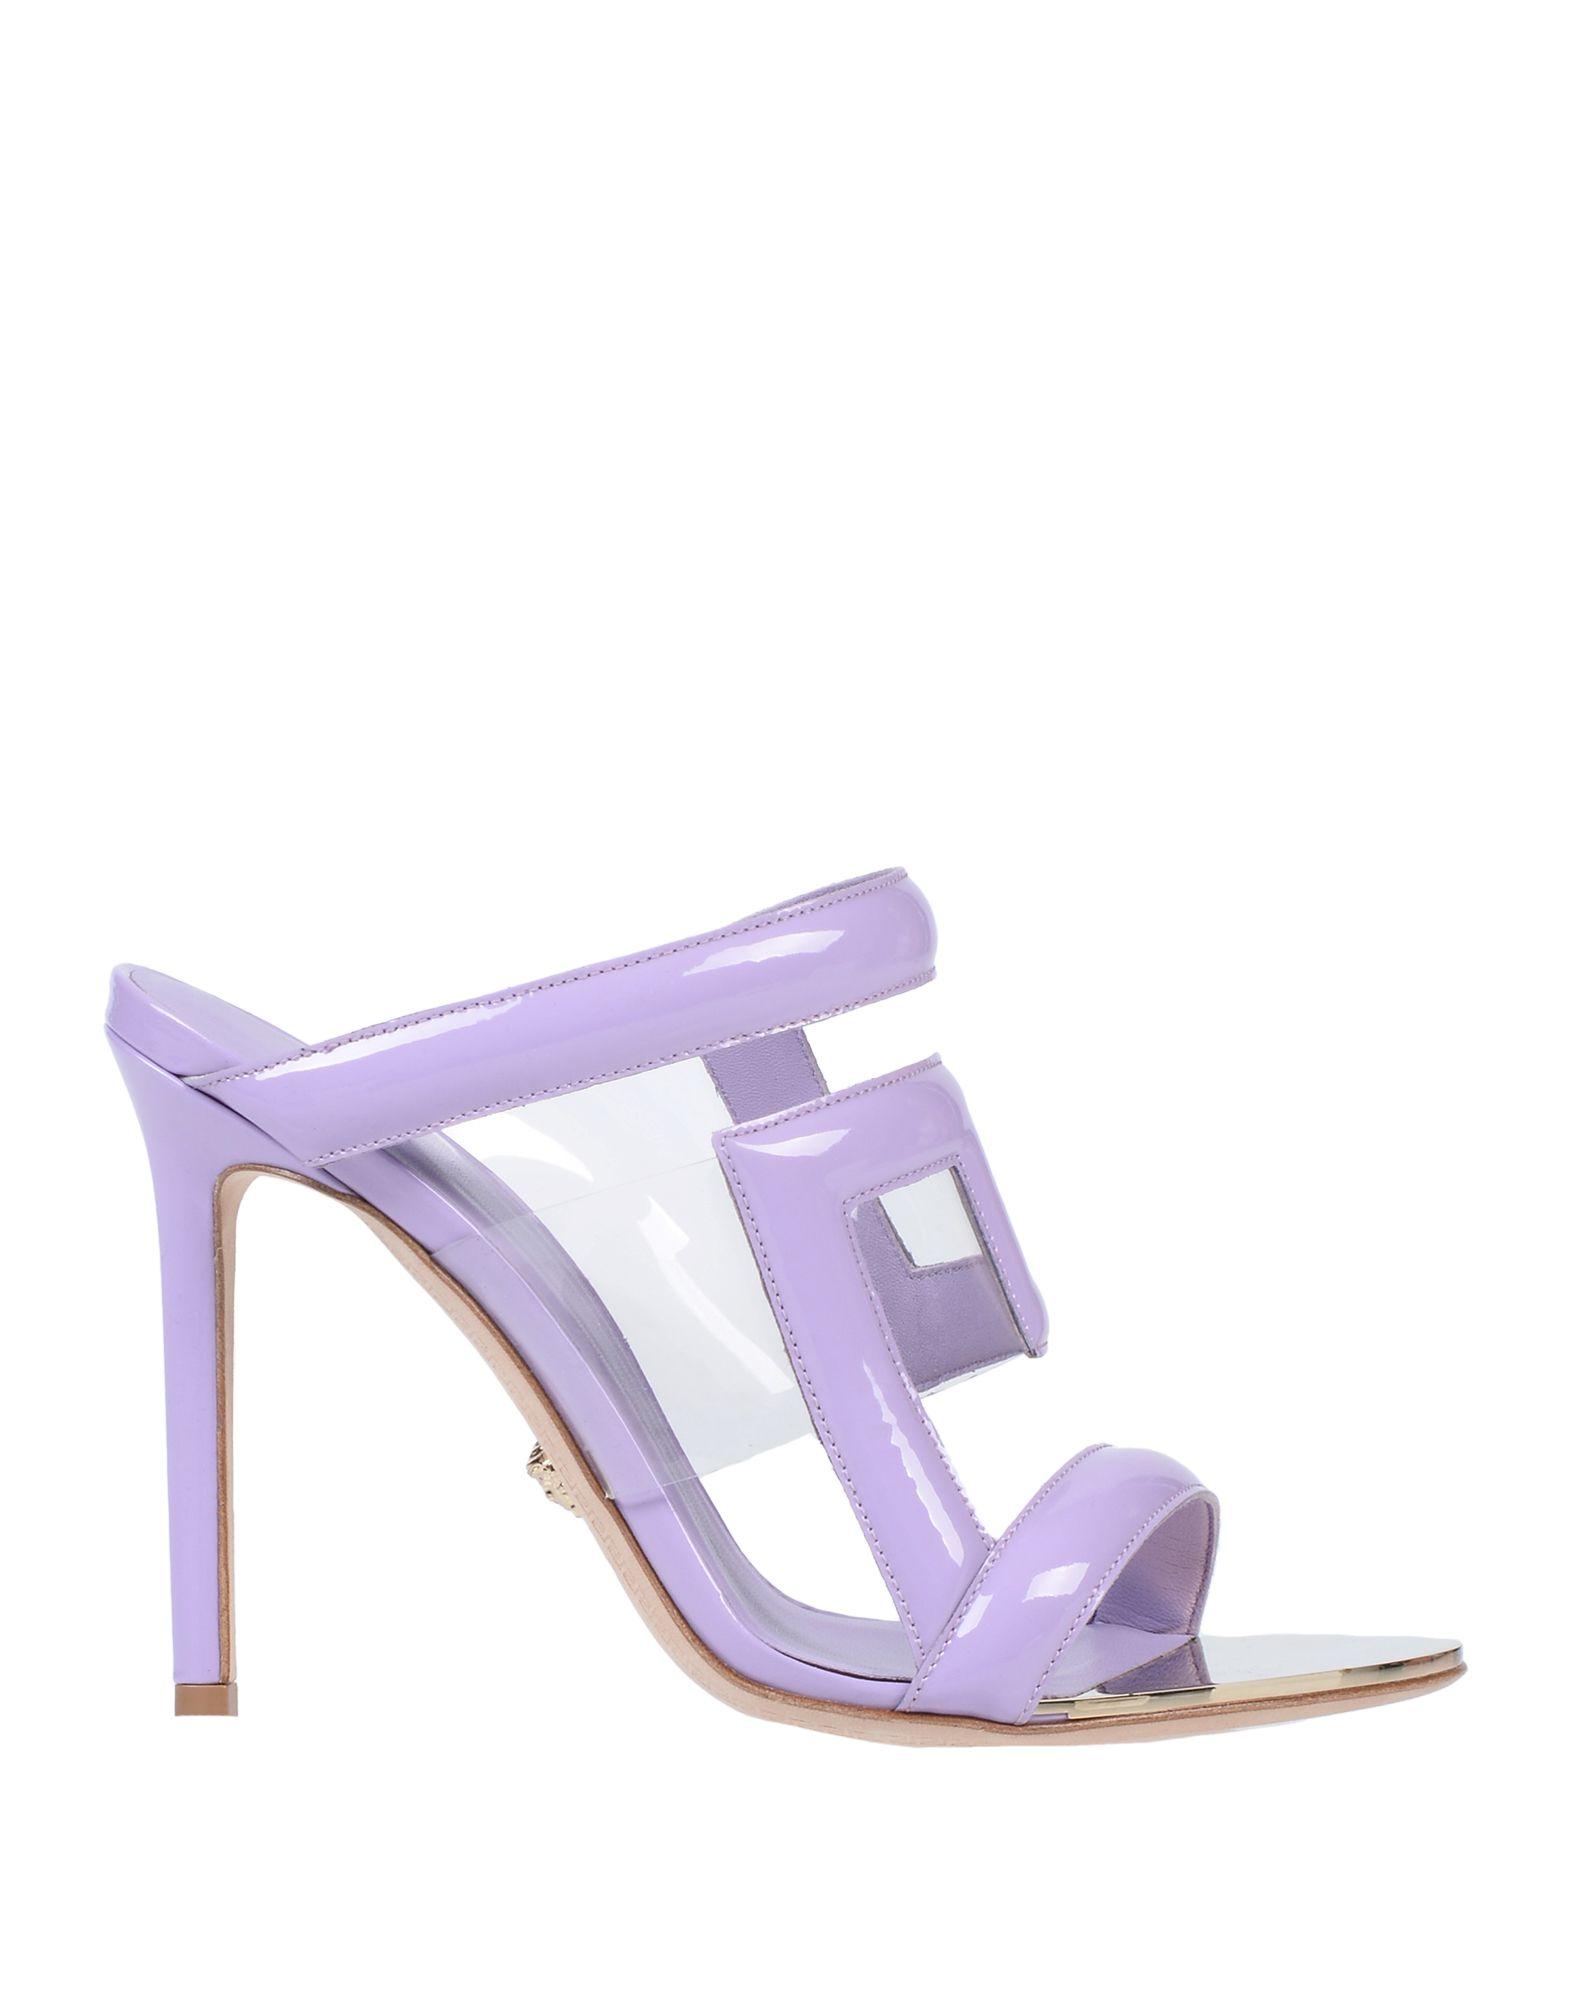 Versace Sandals - Women  Versace Sandals online on  Women Australia - 11492977AN 795c34